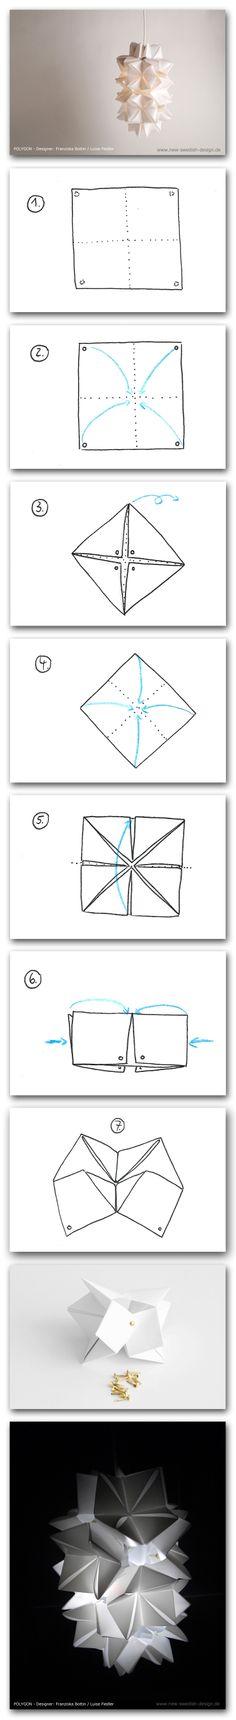 aus // DIY made of (Designer: Franziska Bottin / Luise Fiedler) Swedish Design, Ikea Hack, Origami, Lighting, Diy, Concept, Build Your Own, Bricolage, Origami Paper